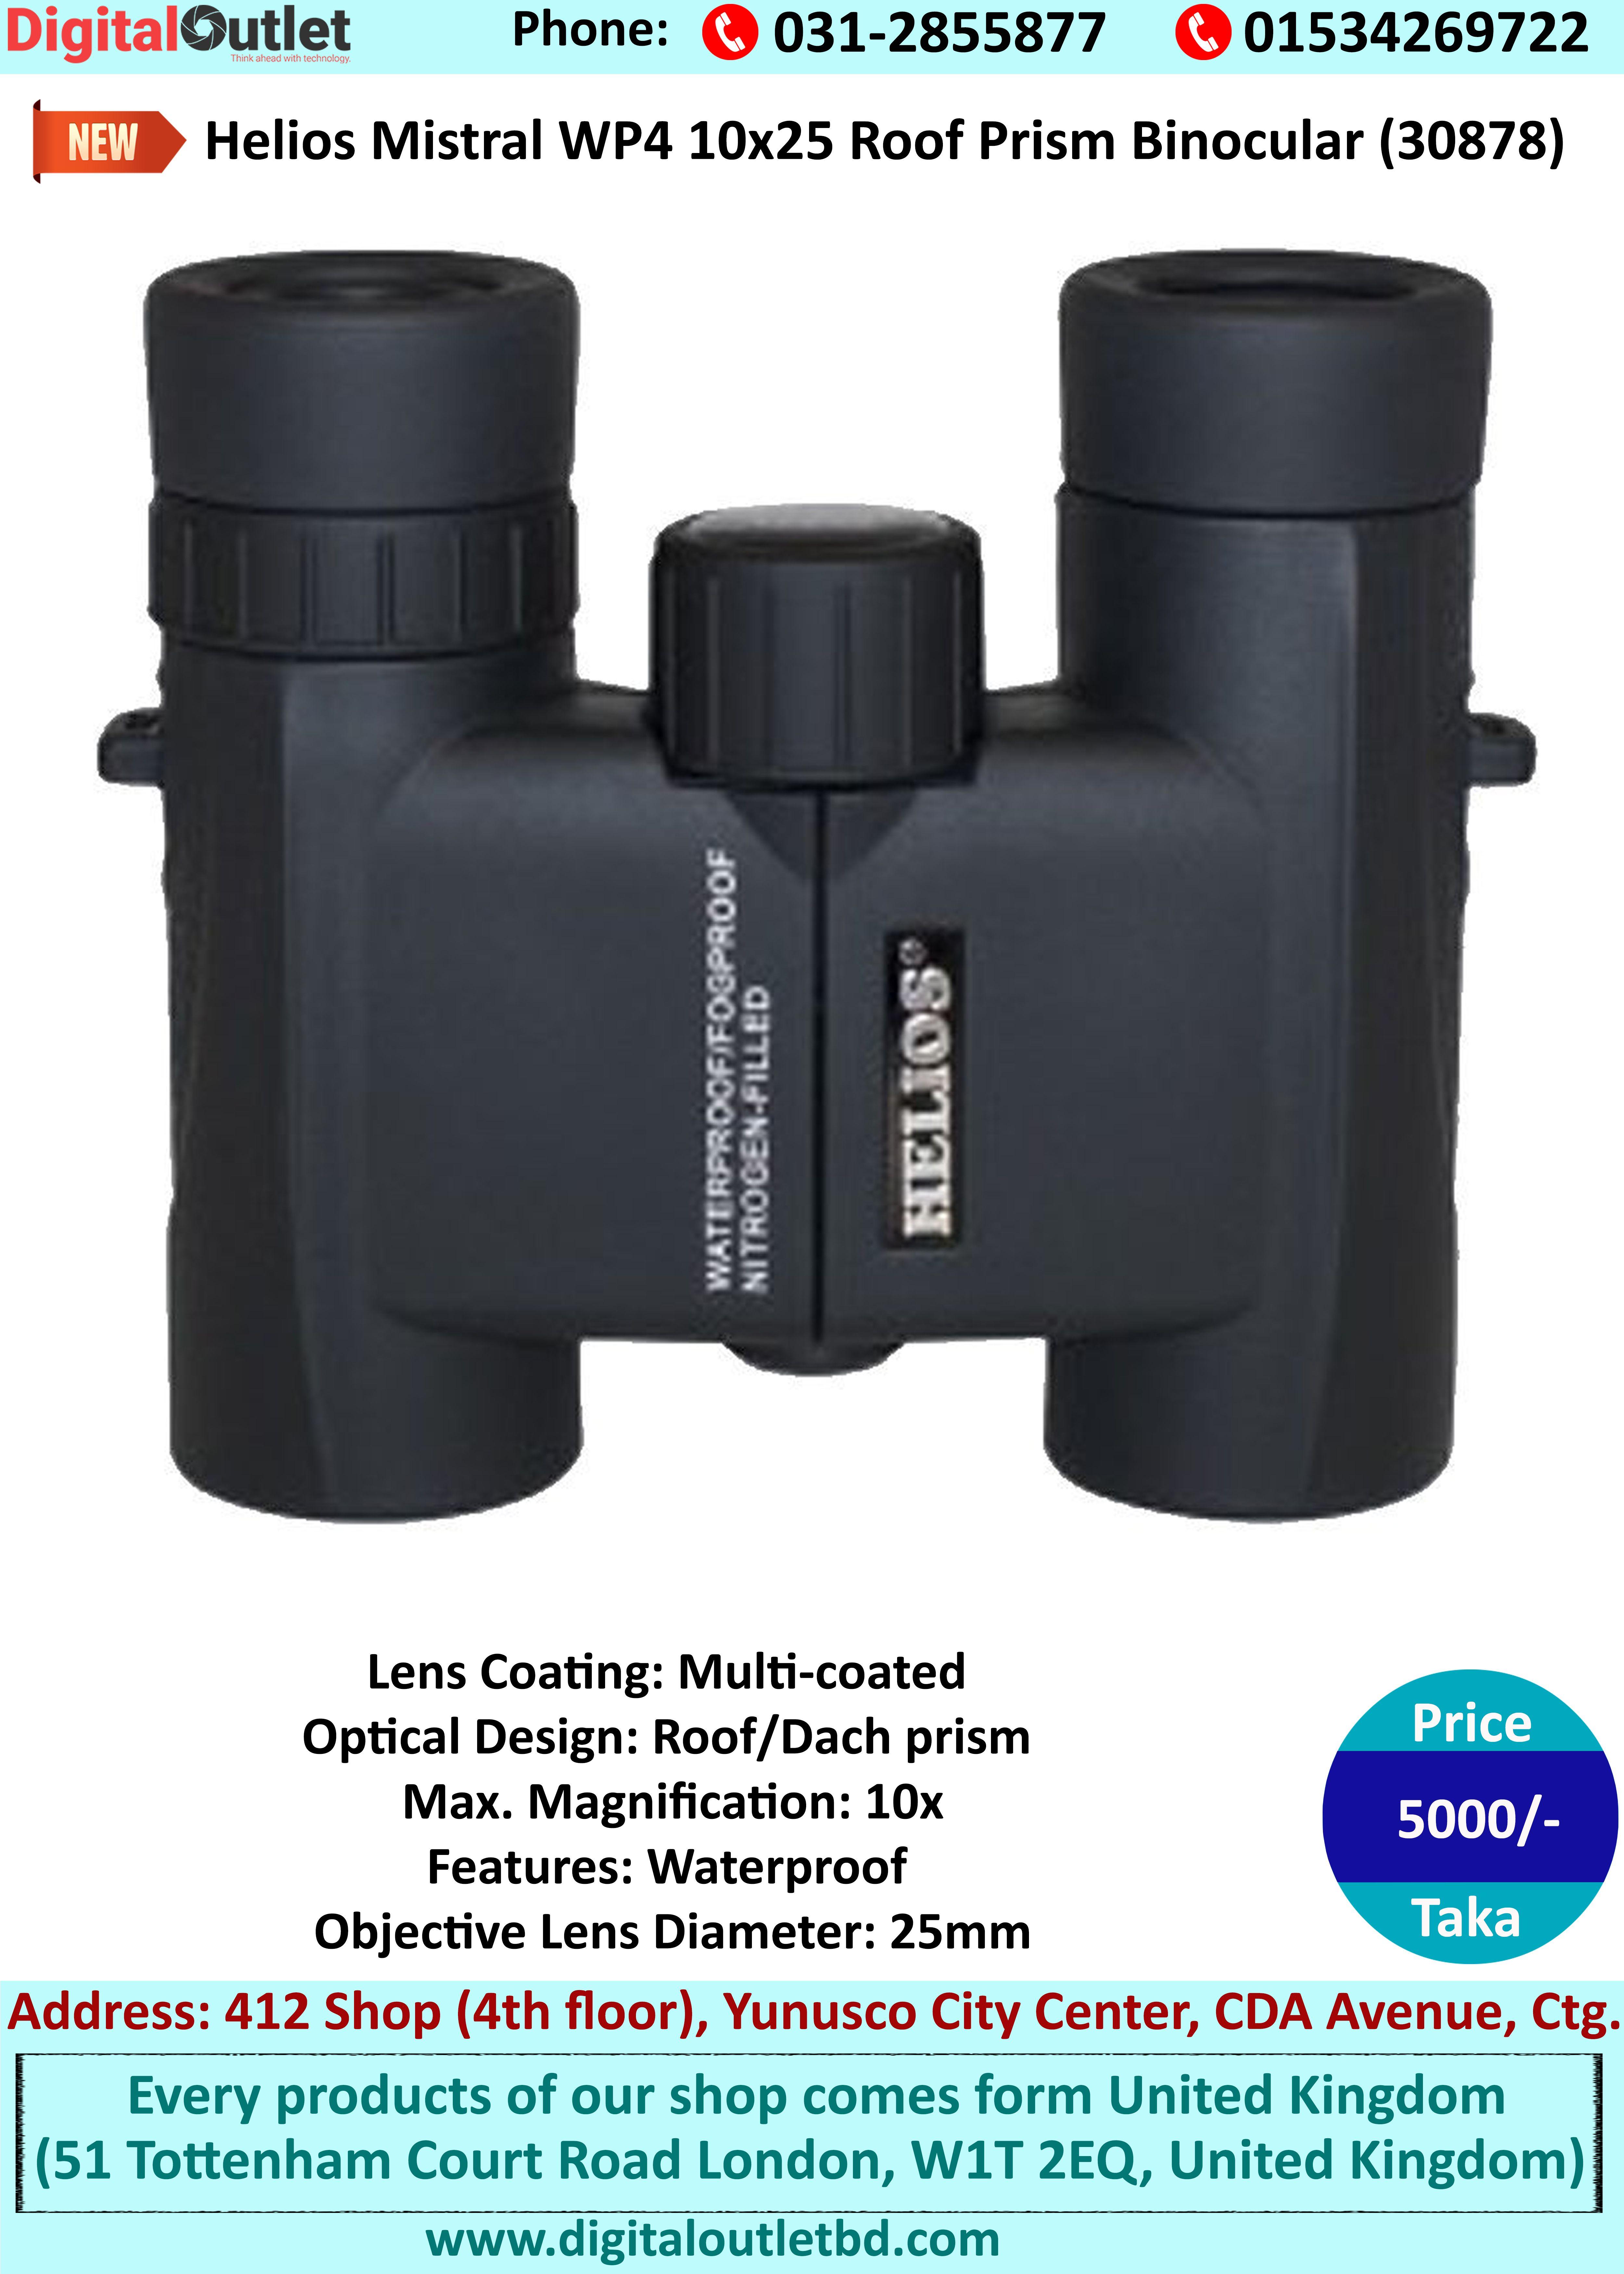 Helios Mistral Wp4 10x25 Roof Prism Binocular 30878 Buying Camera Binoculars Optical